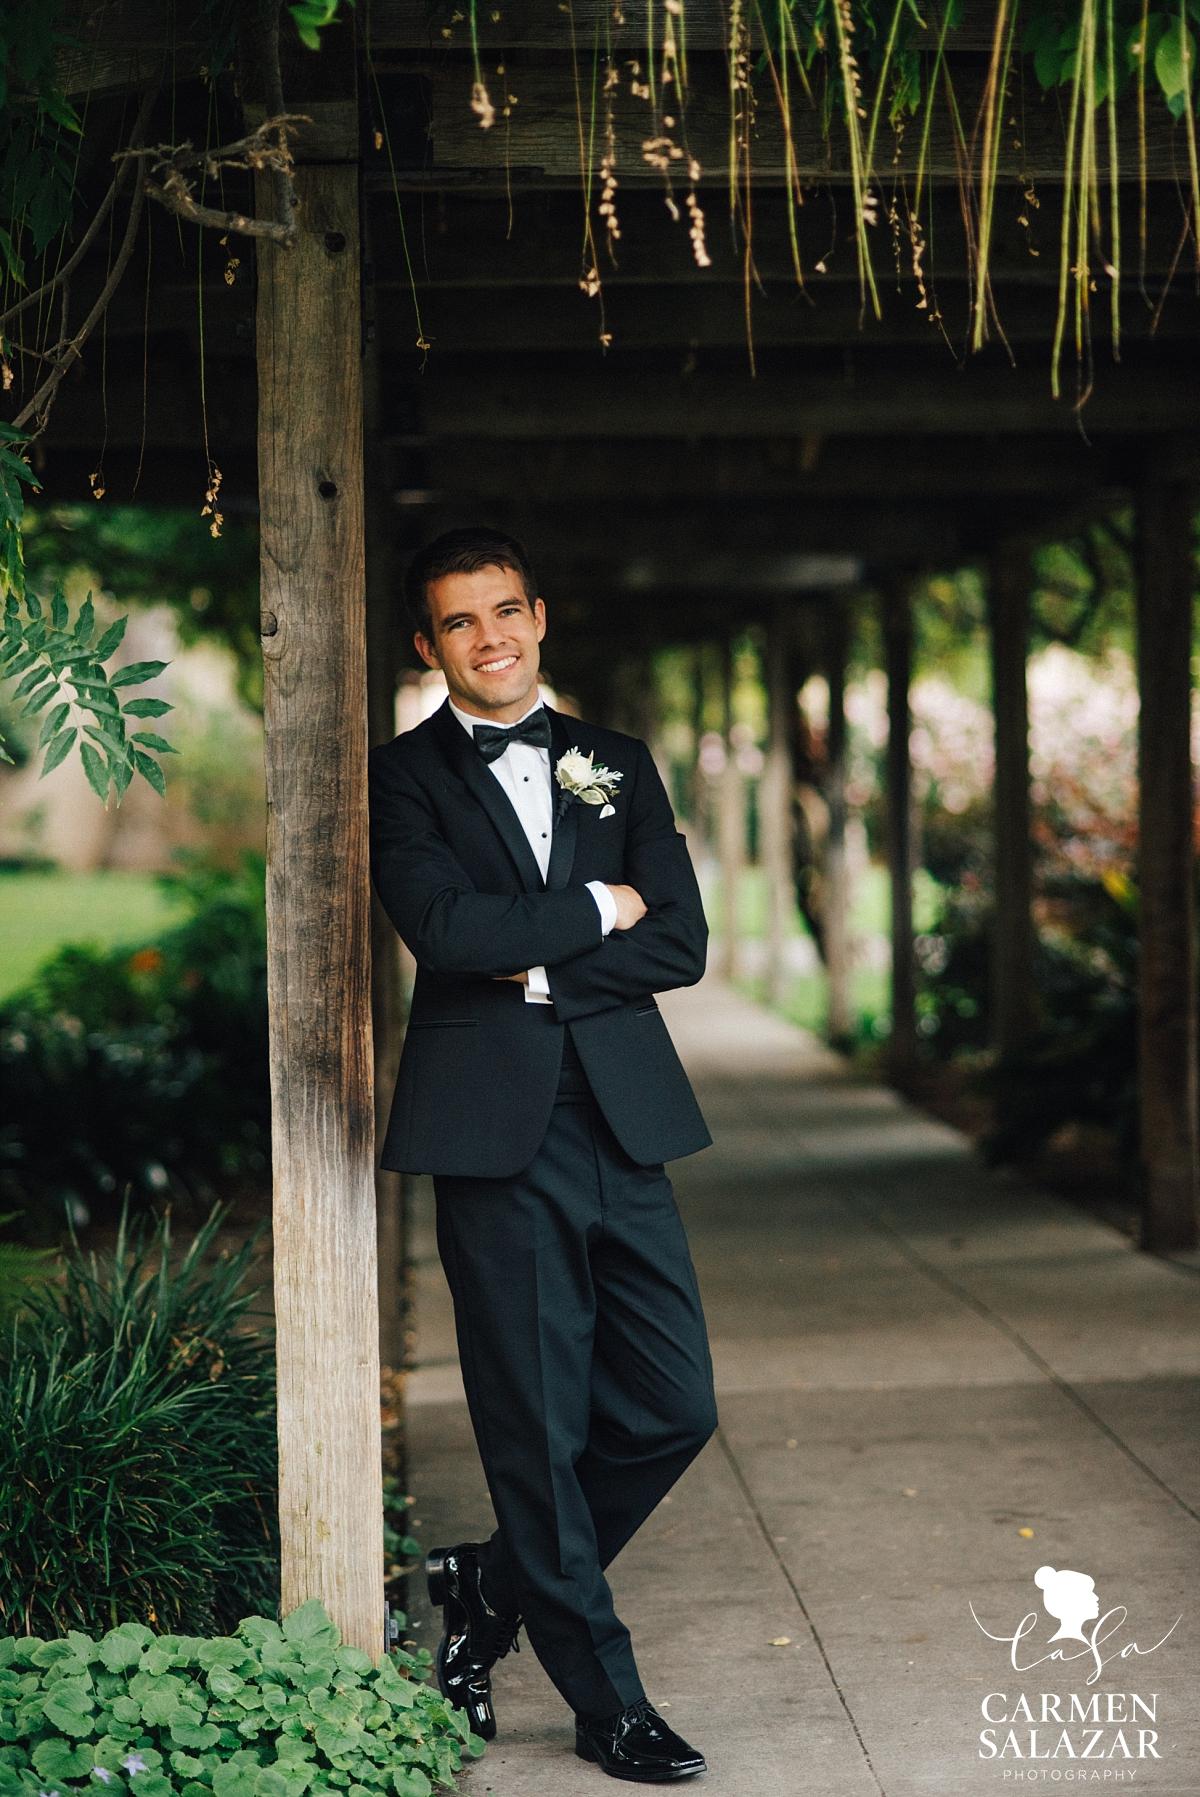 Nostalgic groom wedding portraits - Carmen Salzar